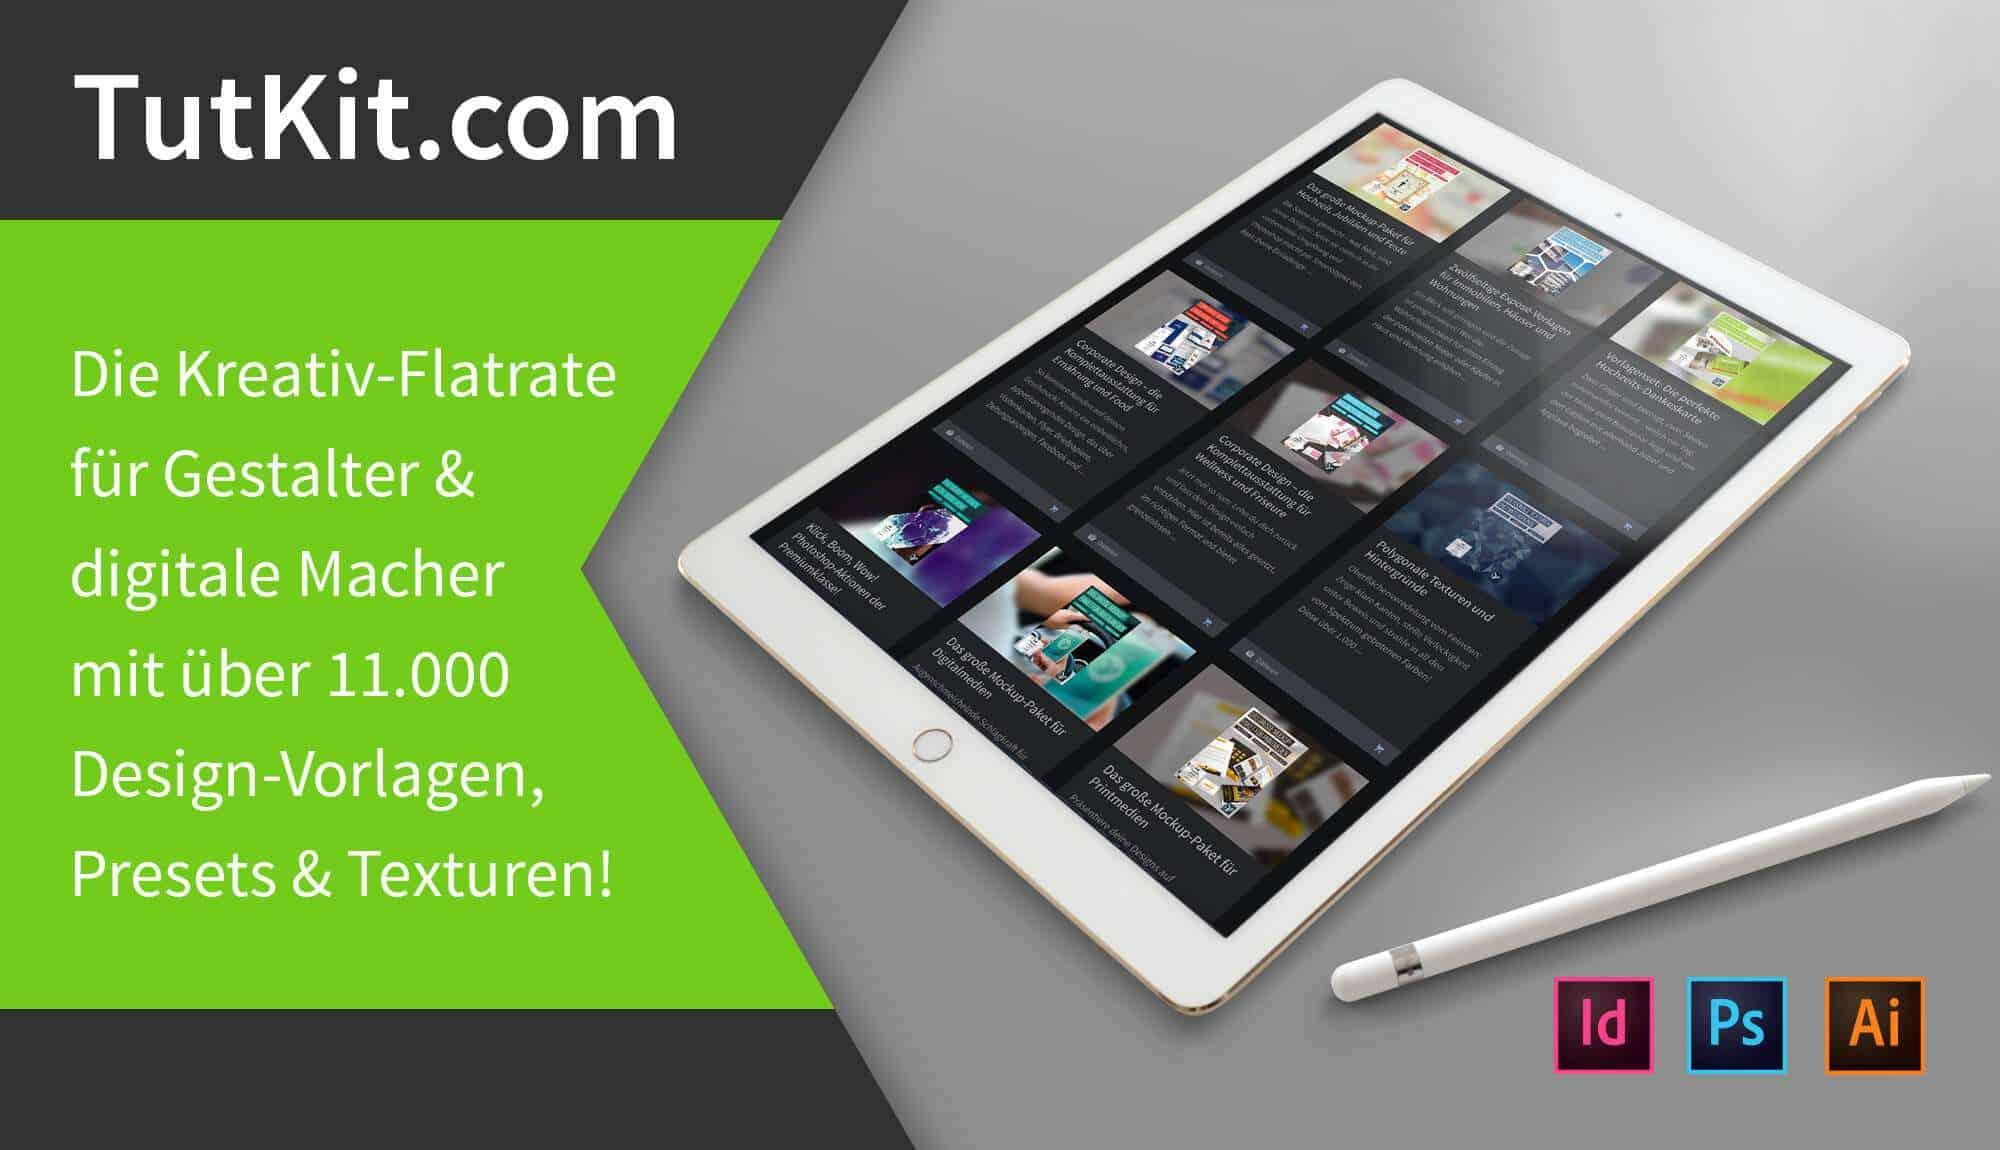 Tutkit.com - Die Kreativ-Flatrate für digitale Macher